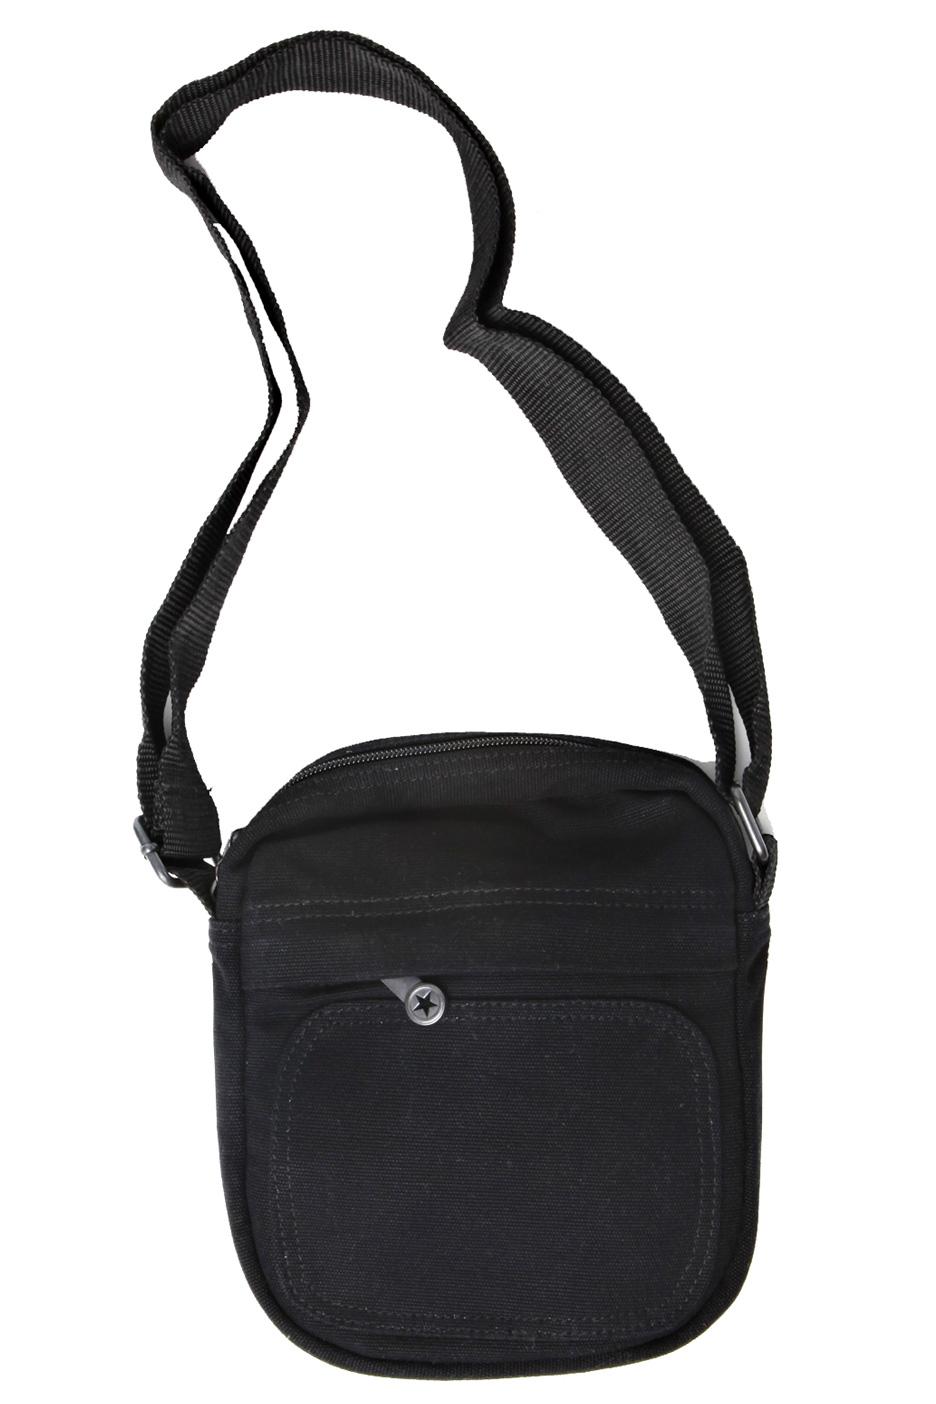 Converse - Chuck Pocket - Bag - Impericon.com UK 460d40e27a